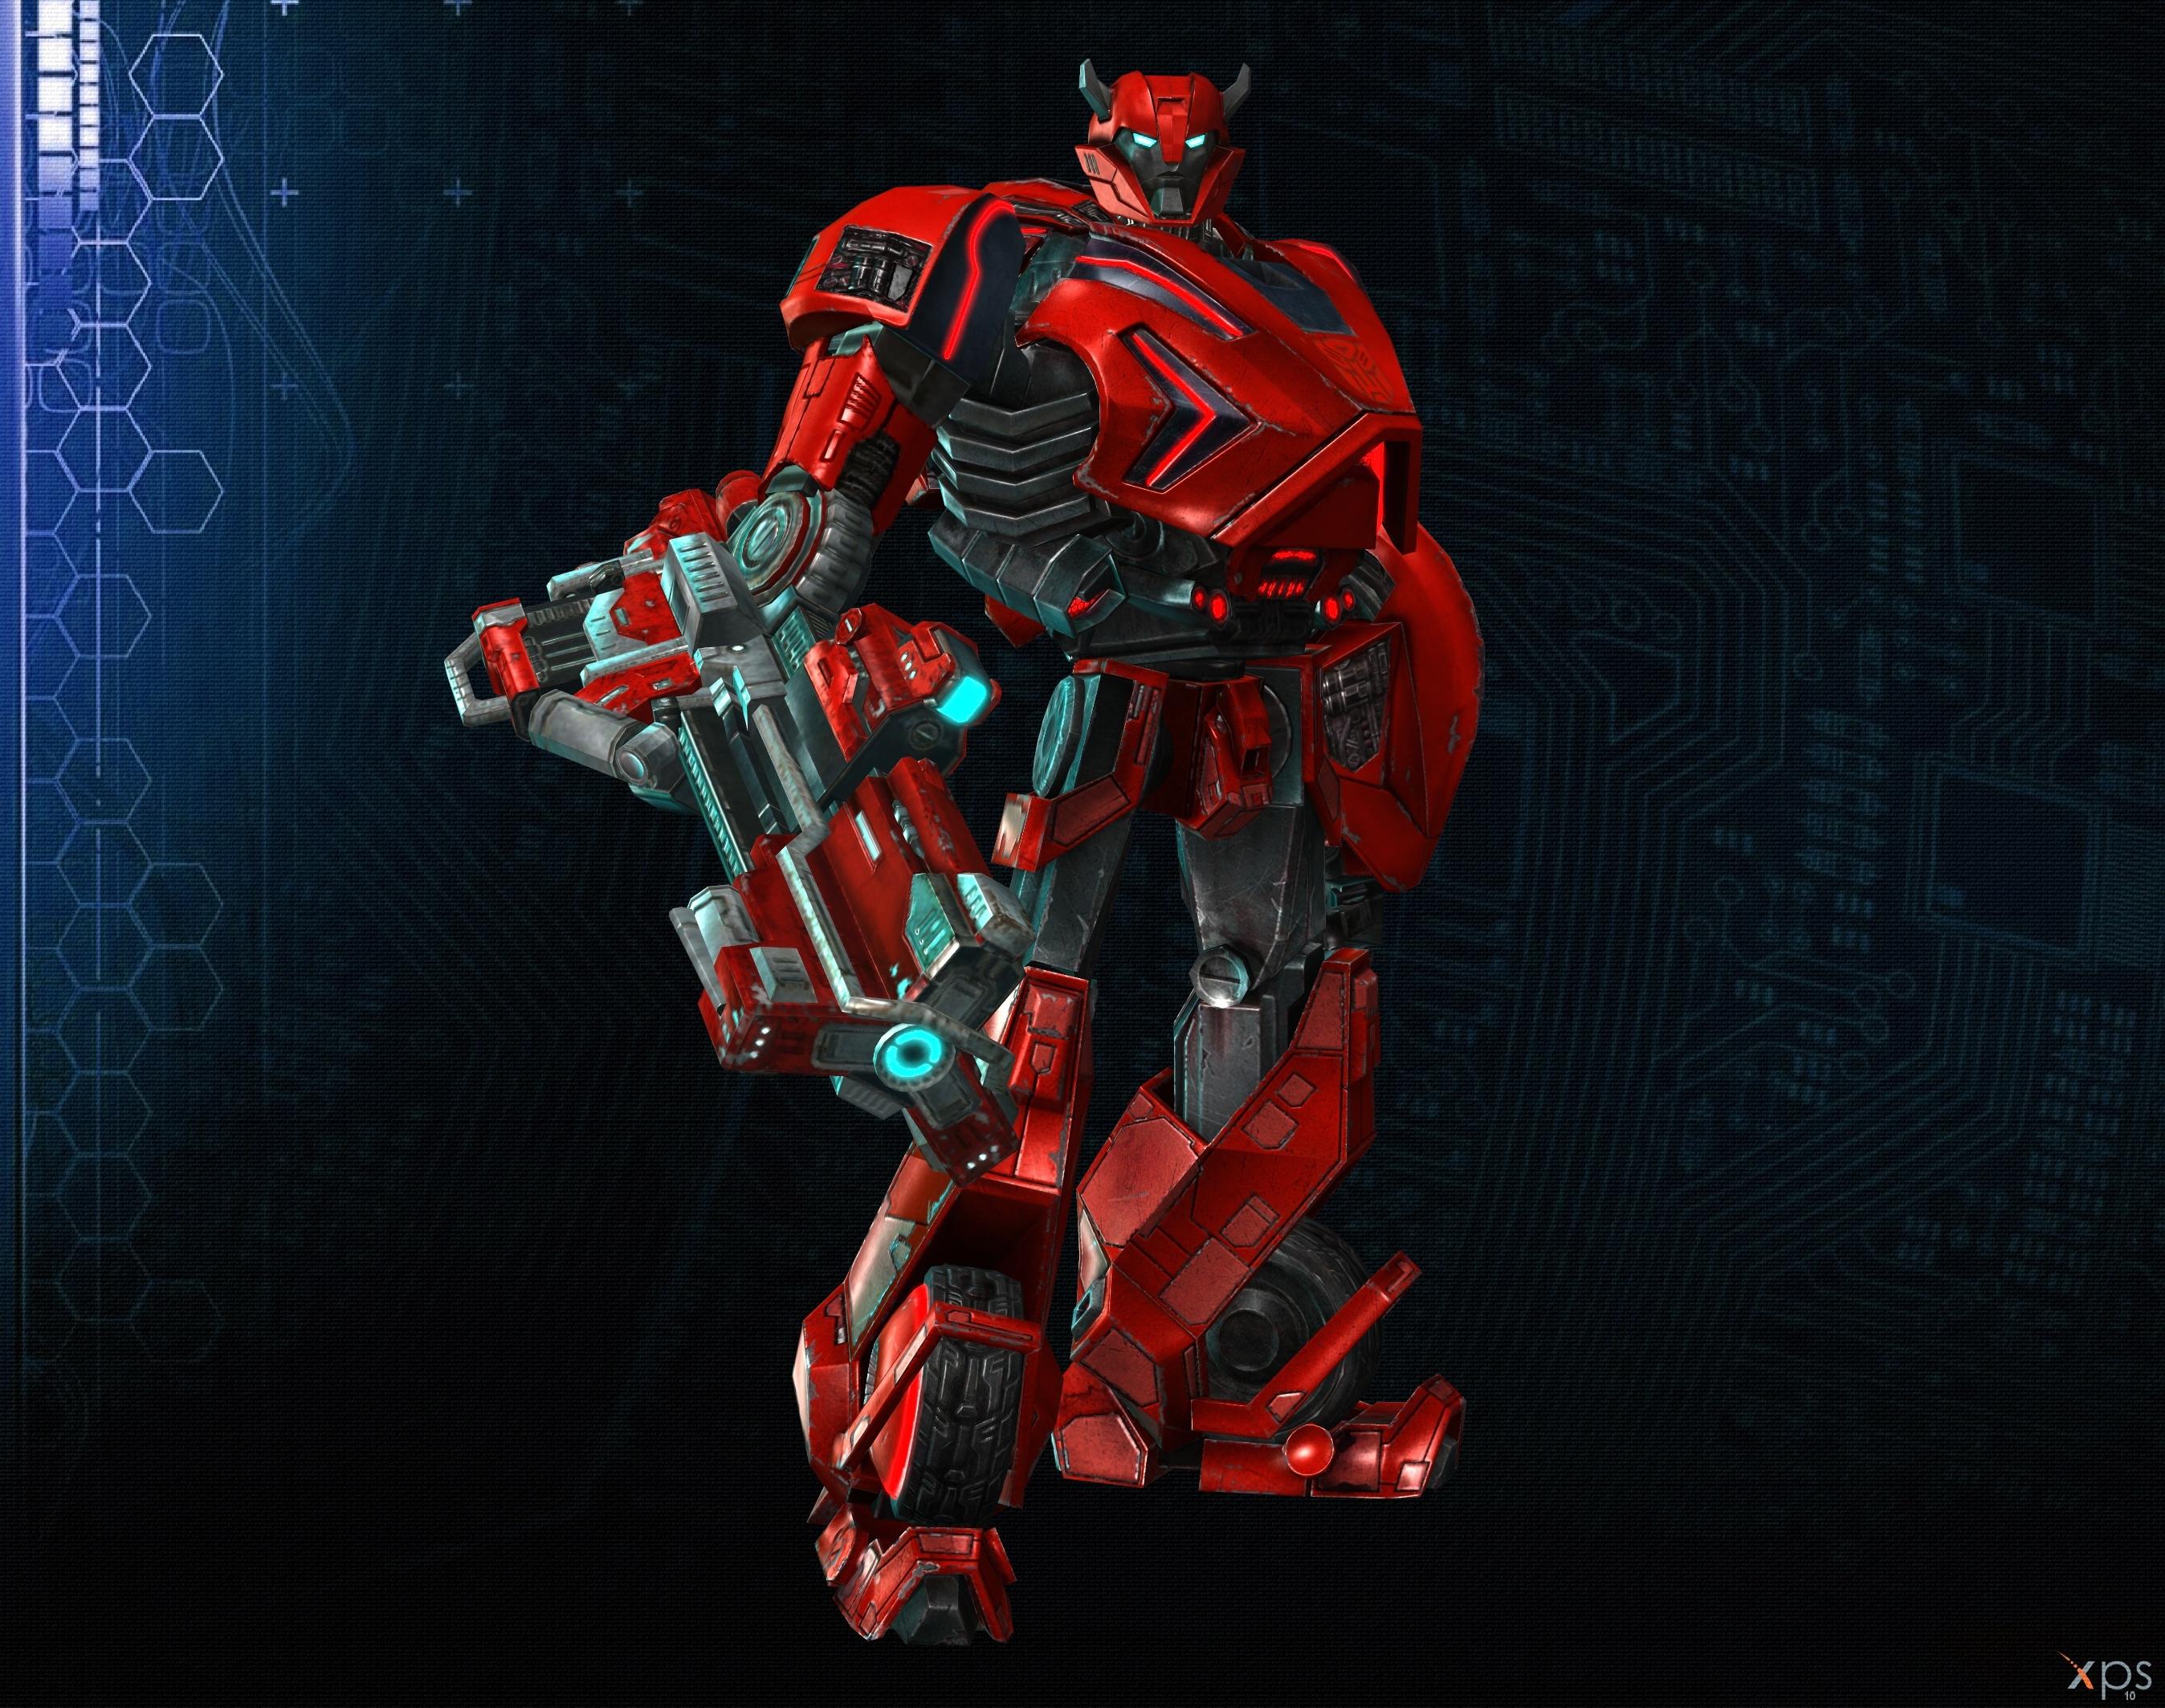 transformers cliffjumper rise of the dark spark